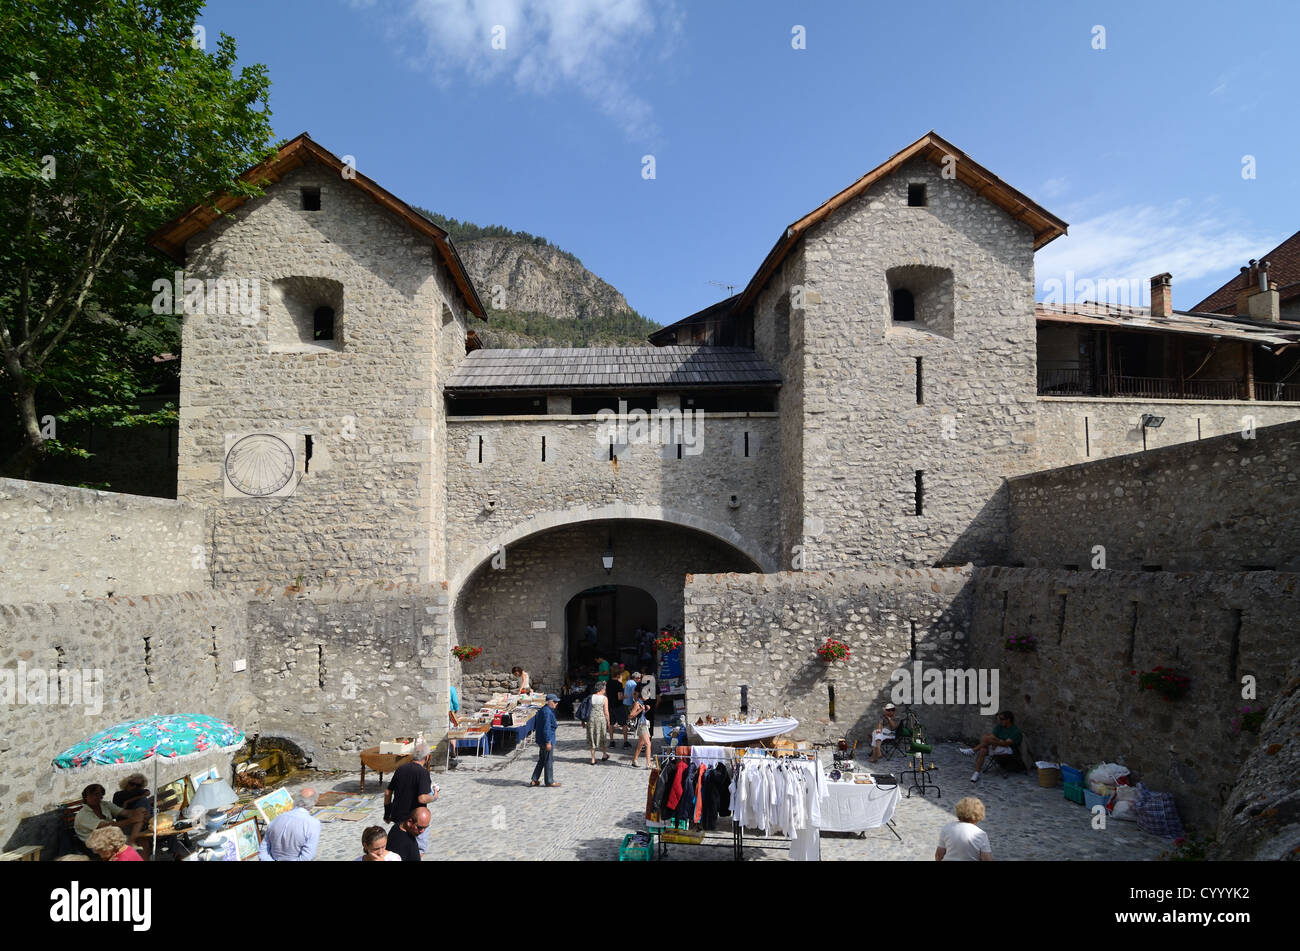 Porte de France or Town Gate of Fortified Town by Vauban of Colmars-les-Alpes Alpes-de-Haute-Provence France - Stock Image